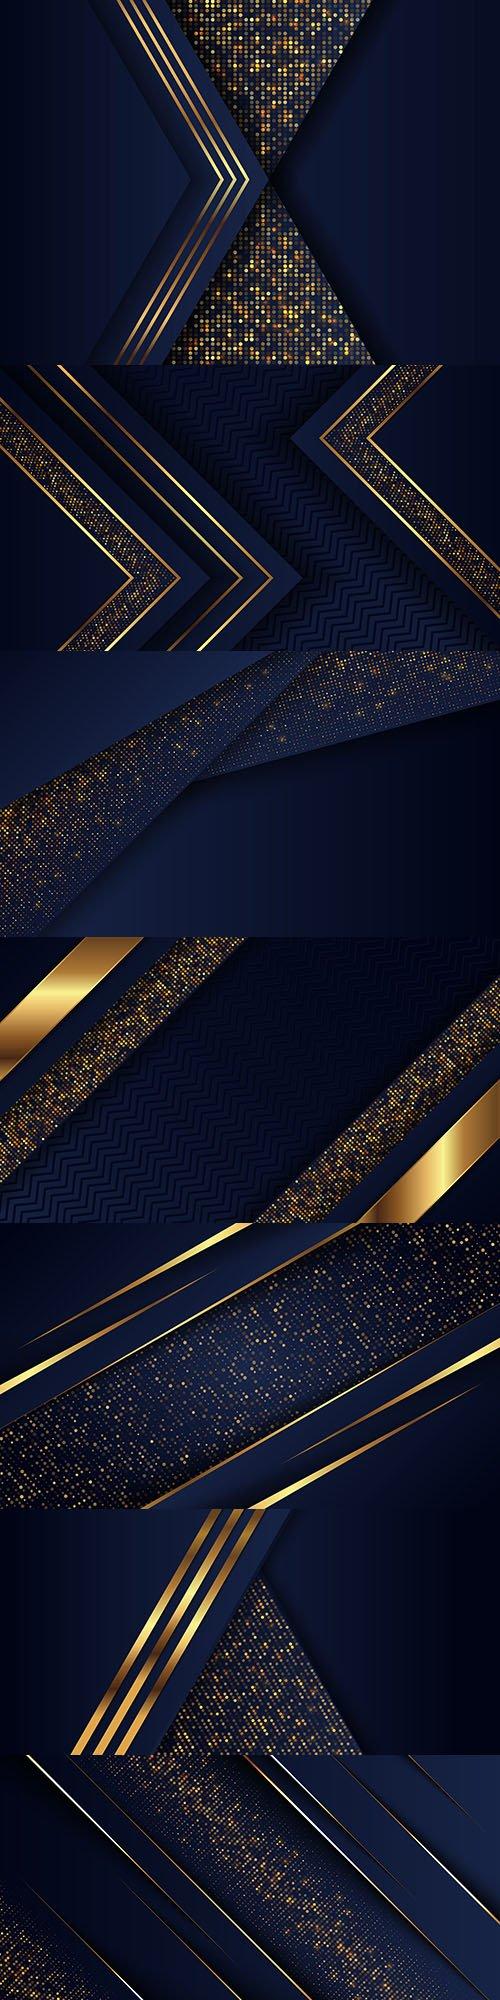 Luxury background and gold design decorative element 12